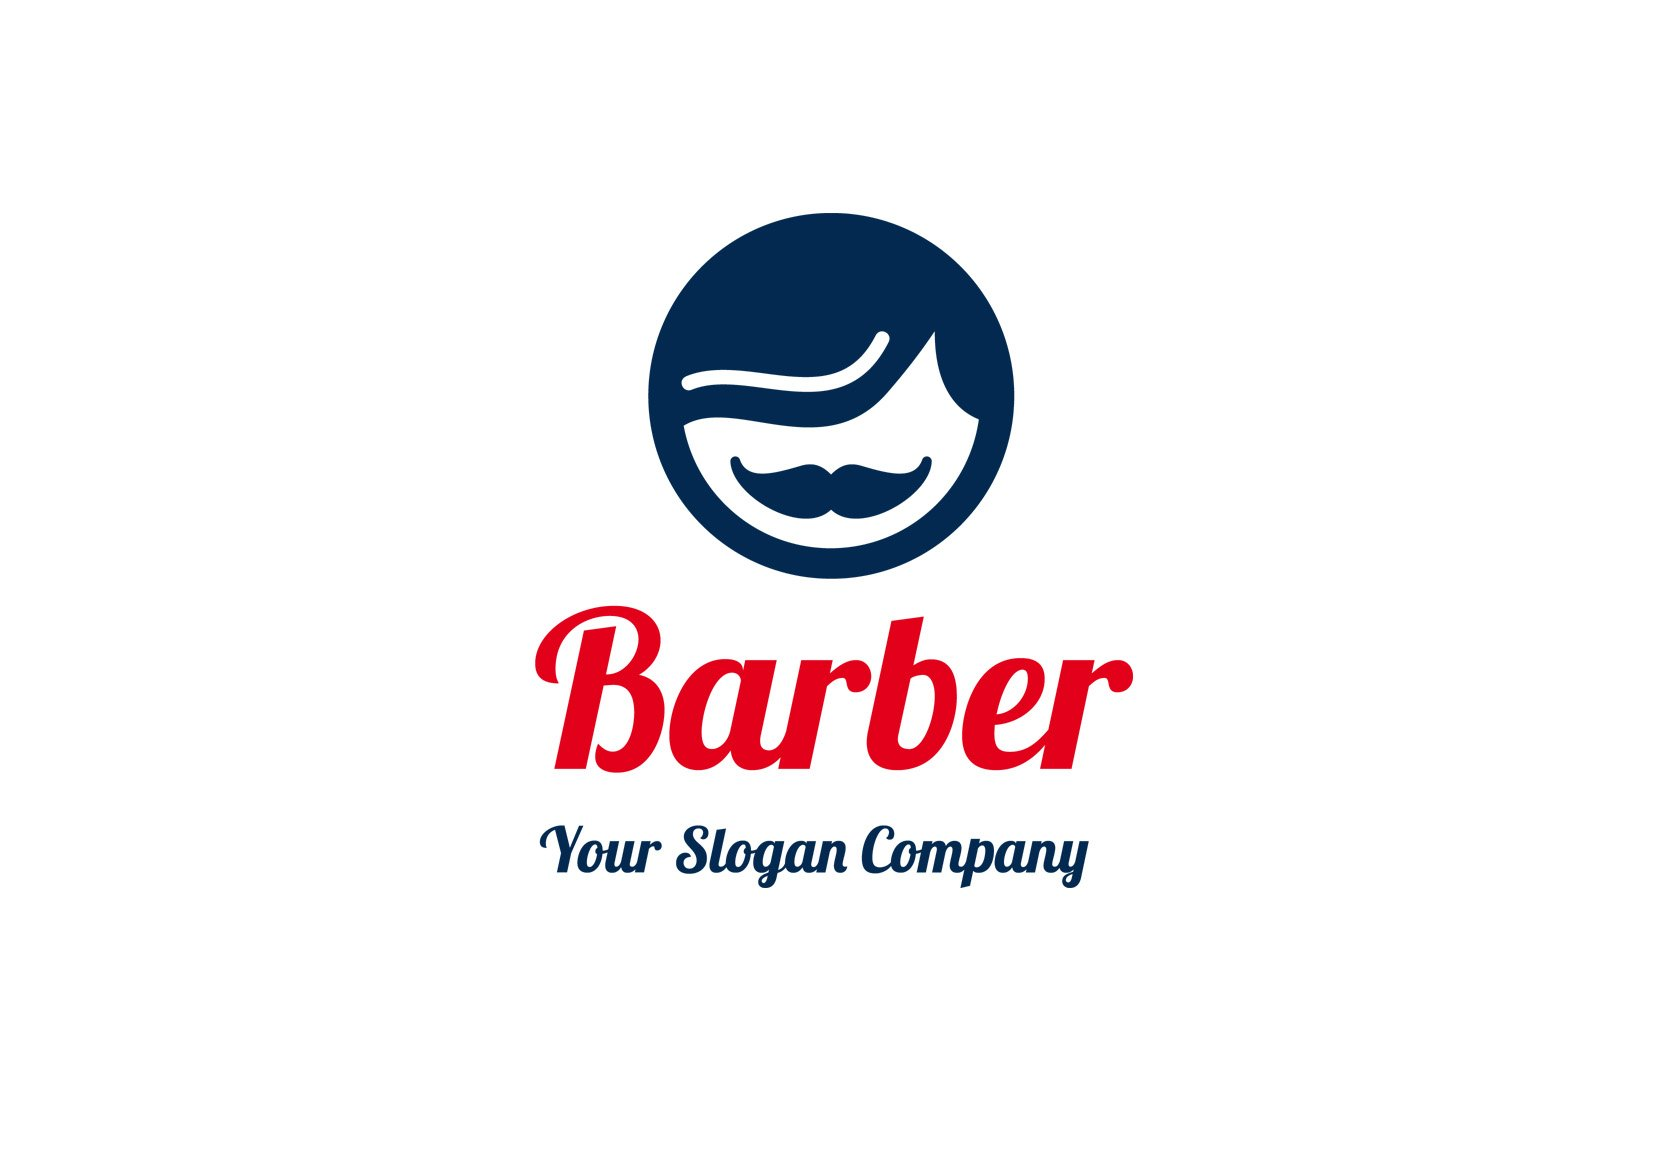 barber logo design - photo #6